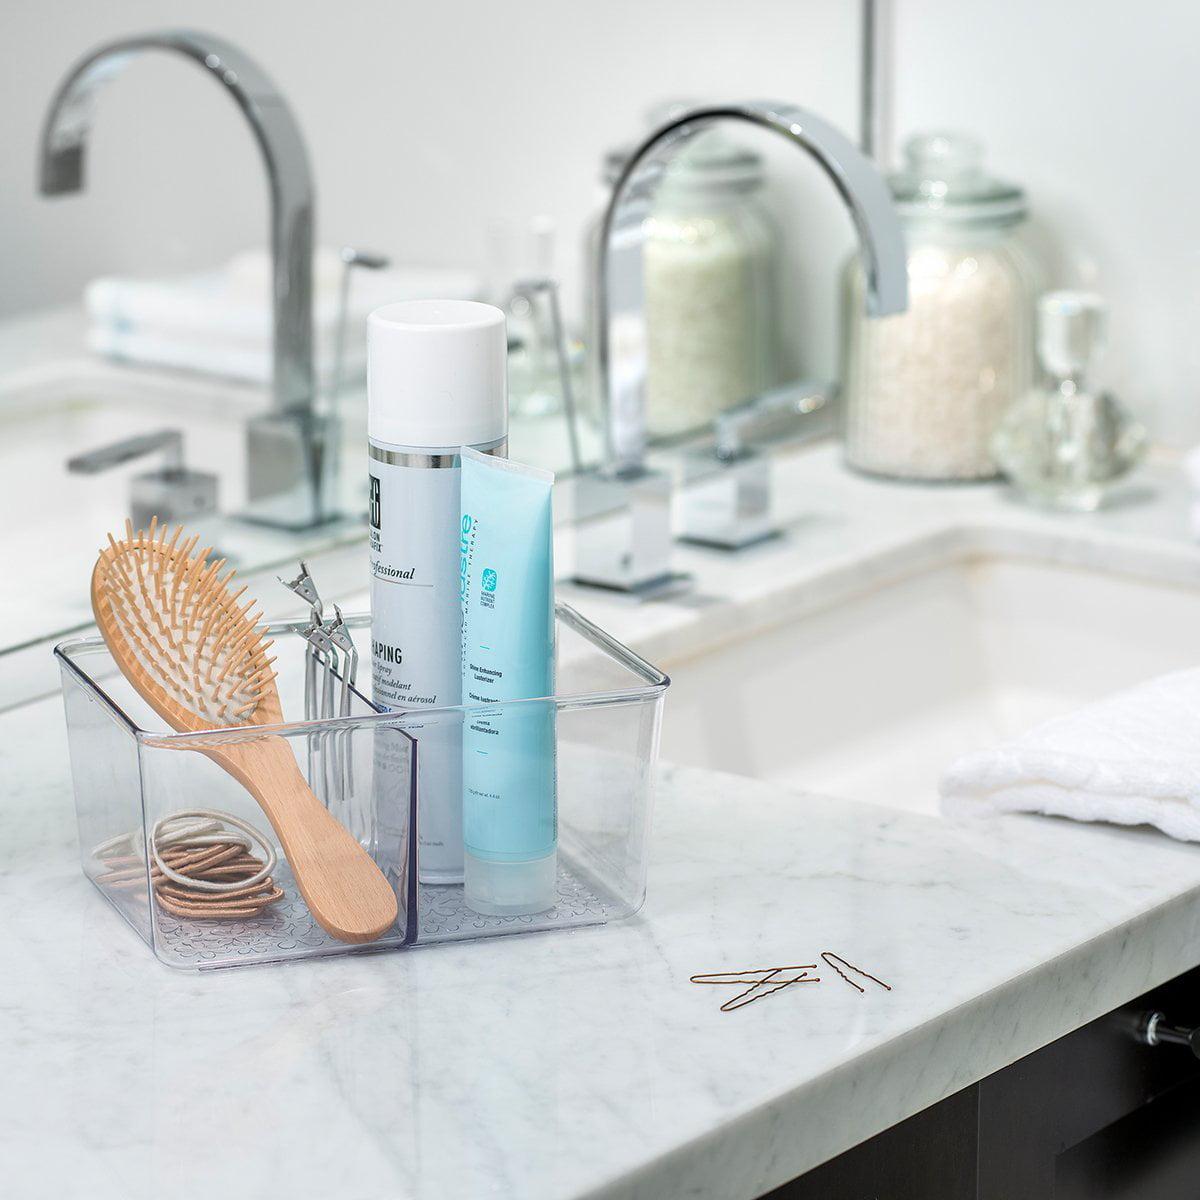 Set Of 2 Vanity Trays Bathroom Storage Organizers Basket For Dresser  Perfume Bin - Walmart